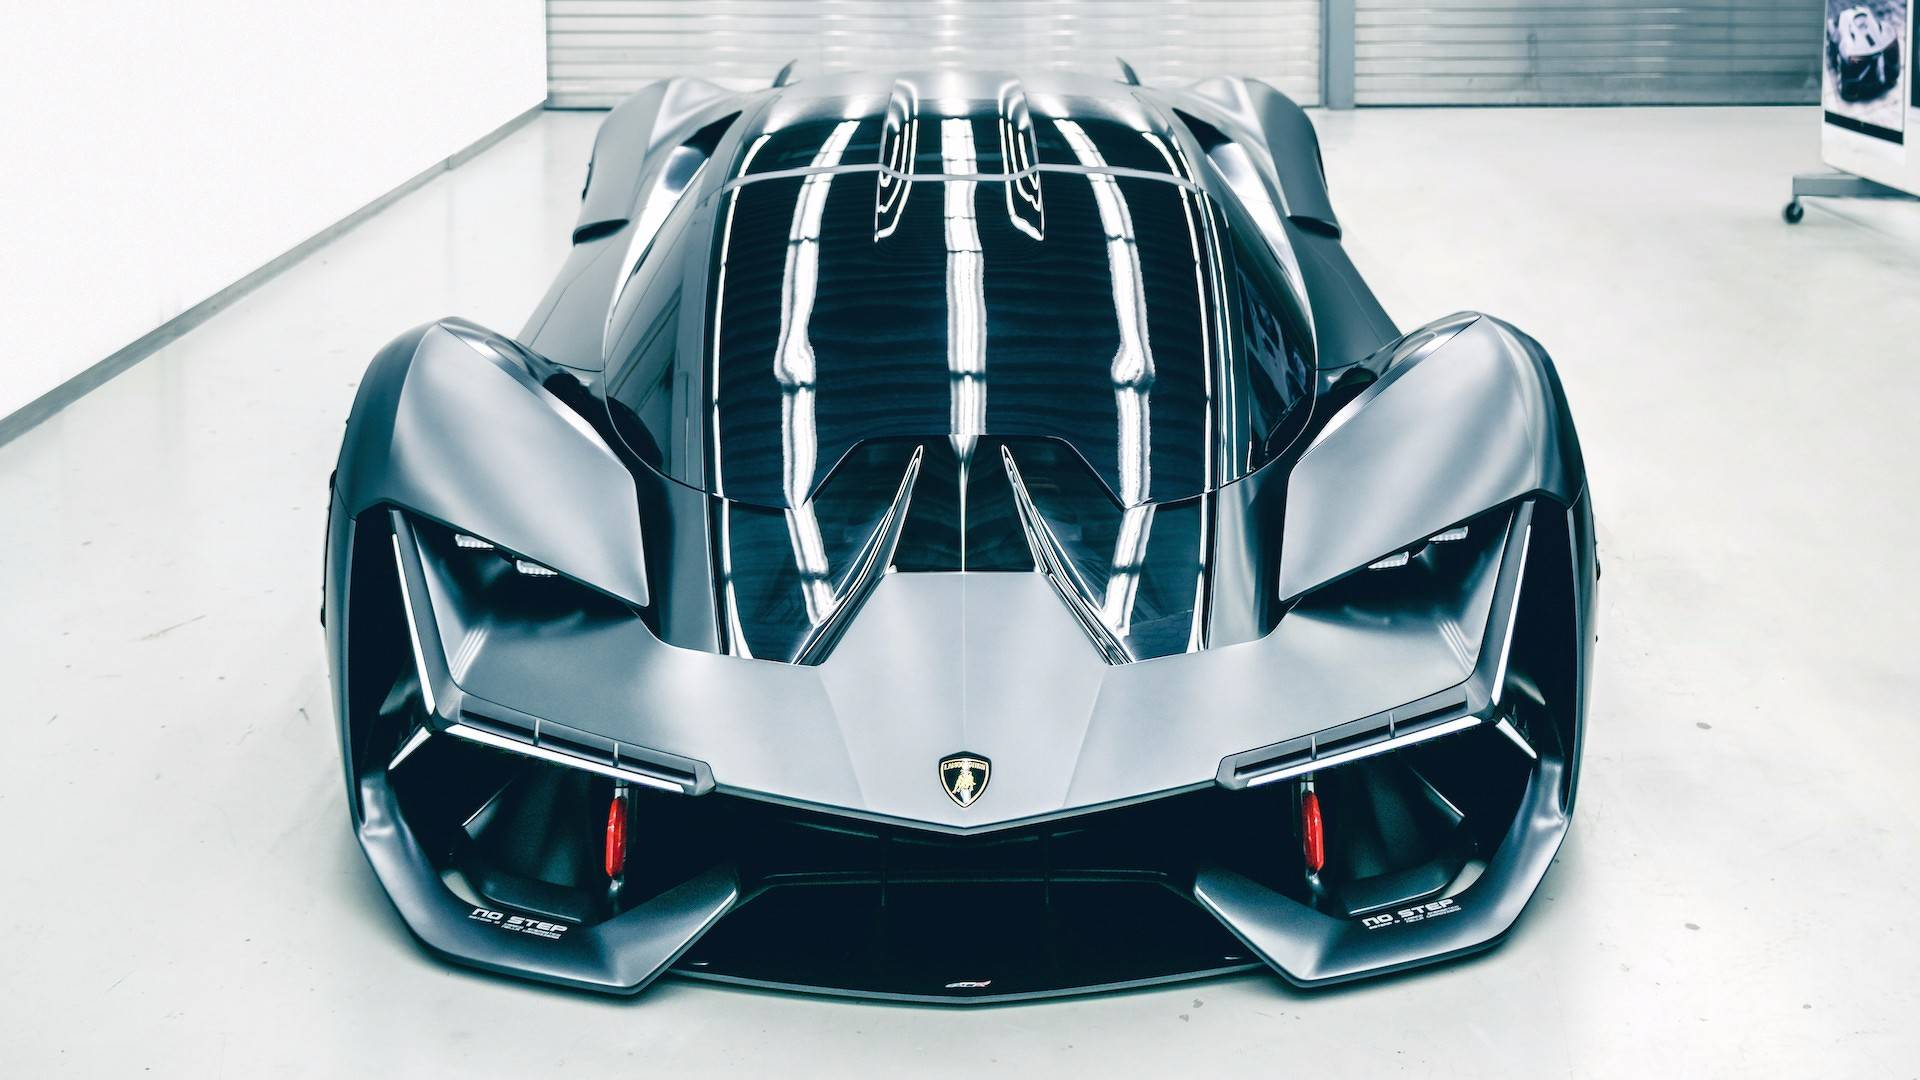 Lamborghini presentará un superdeportivo híbrido en Frankfurt, ¡prepárate!